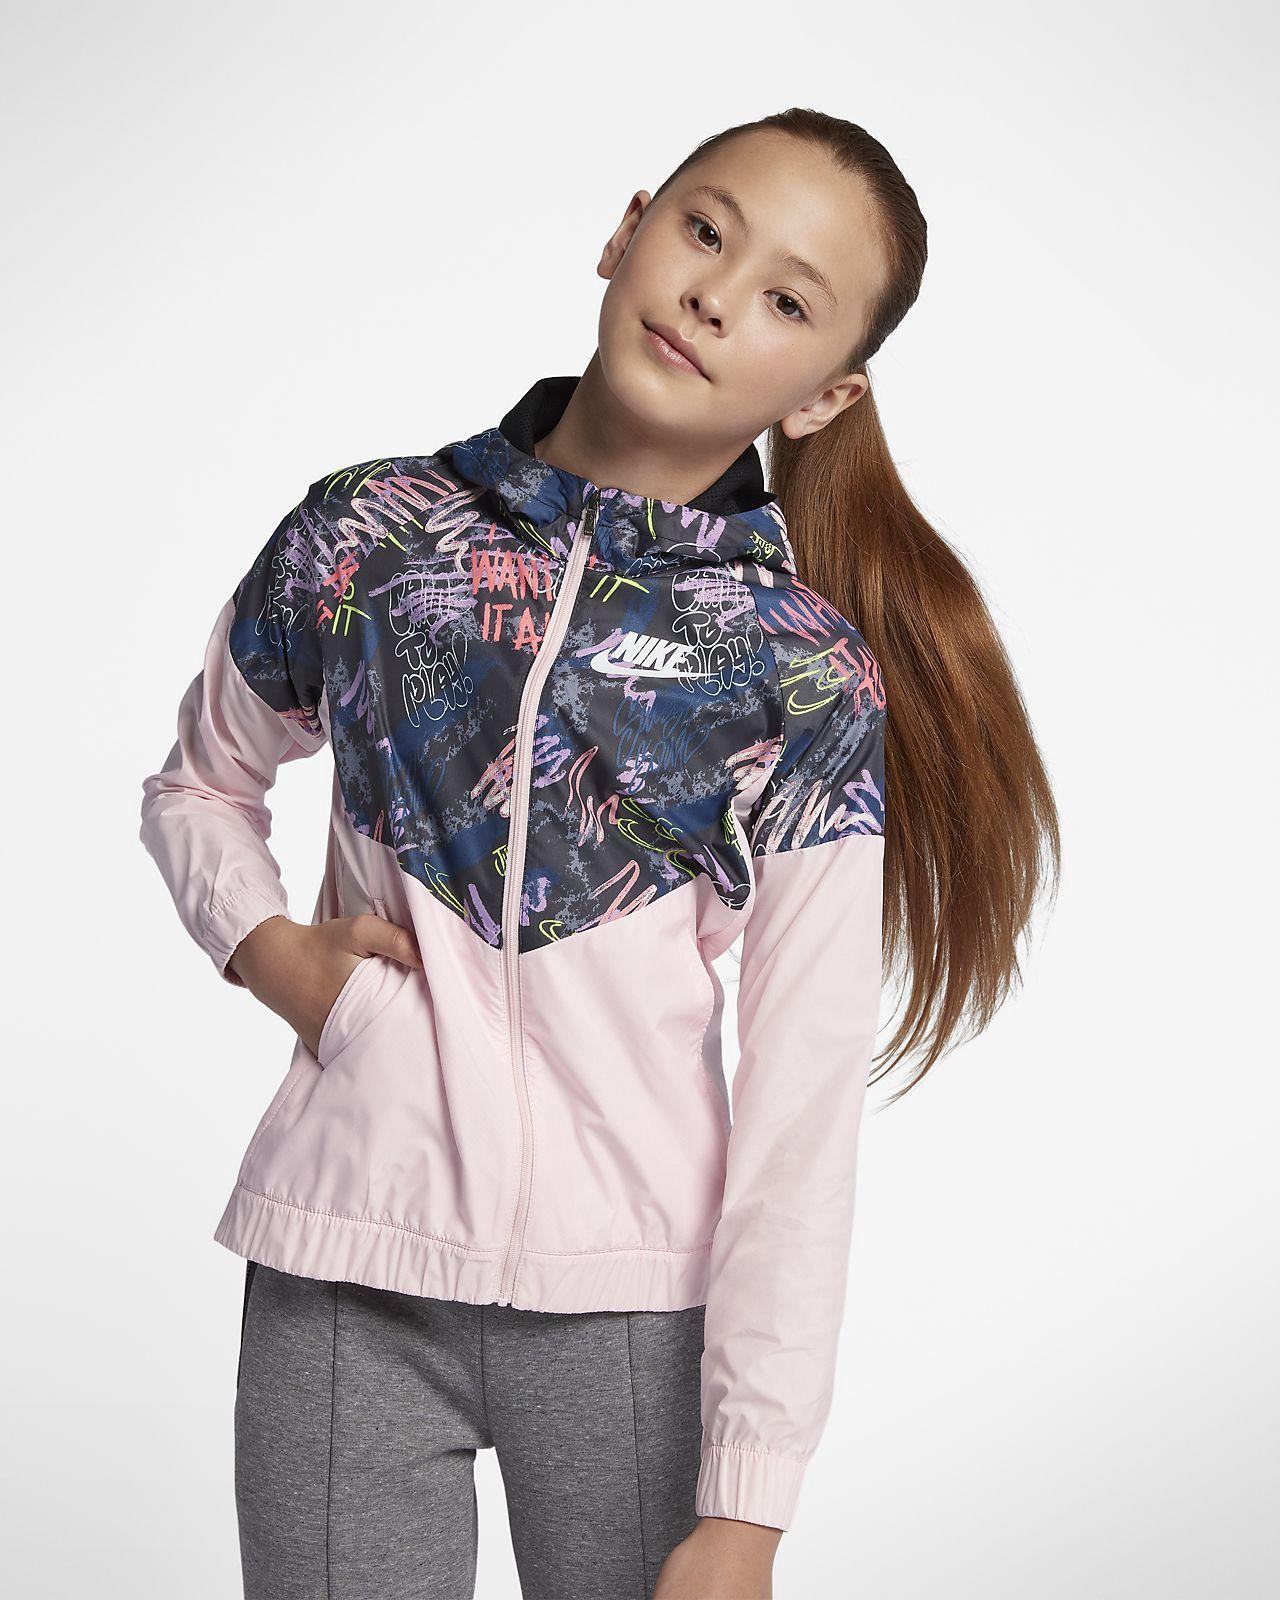 49c4e17f Nike Sportswear Windrunner Big Kids' (Girls') Printed Jacket - M (10-12)